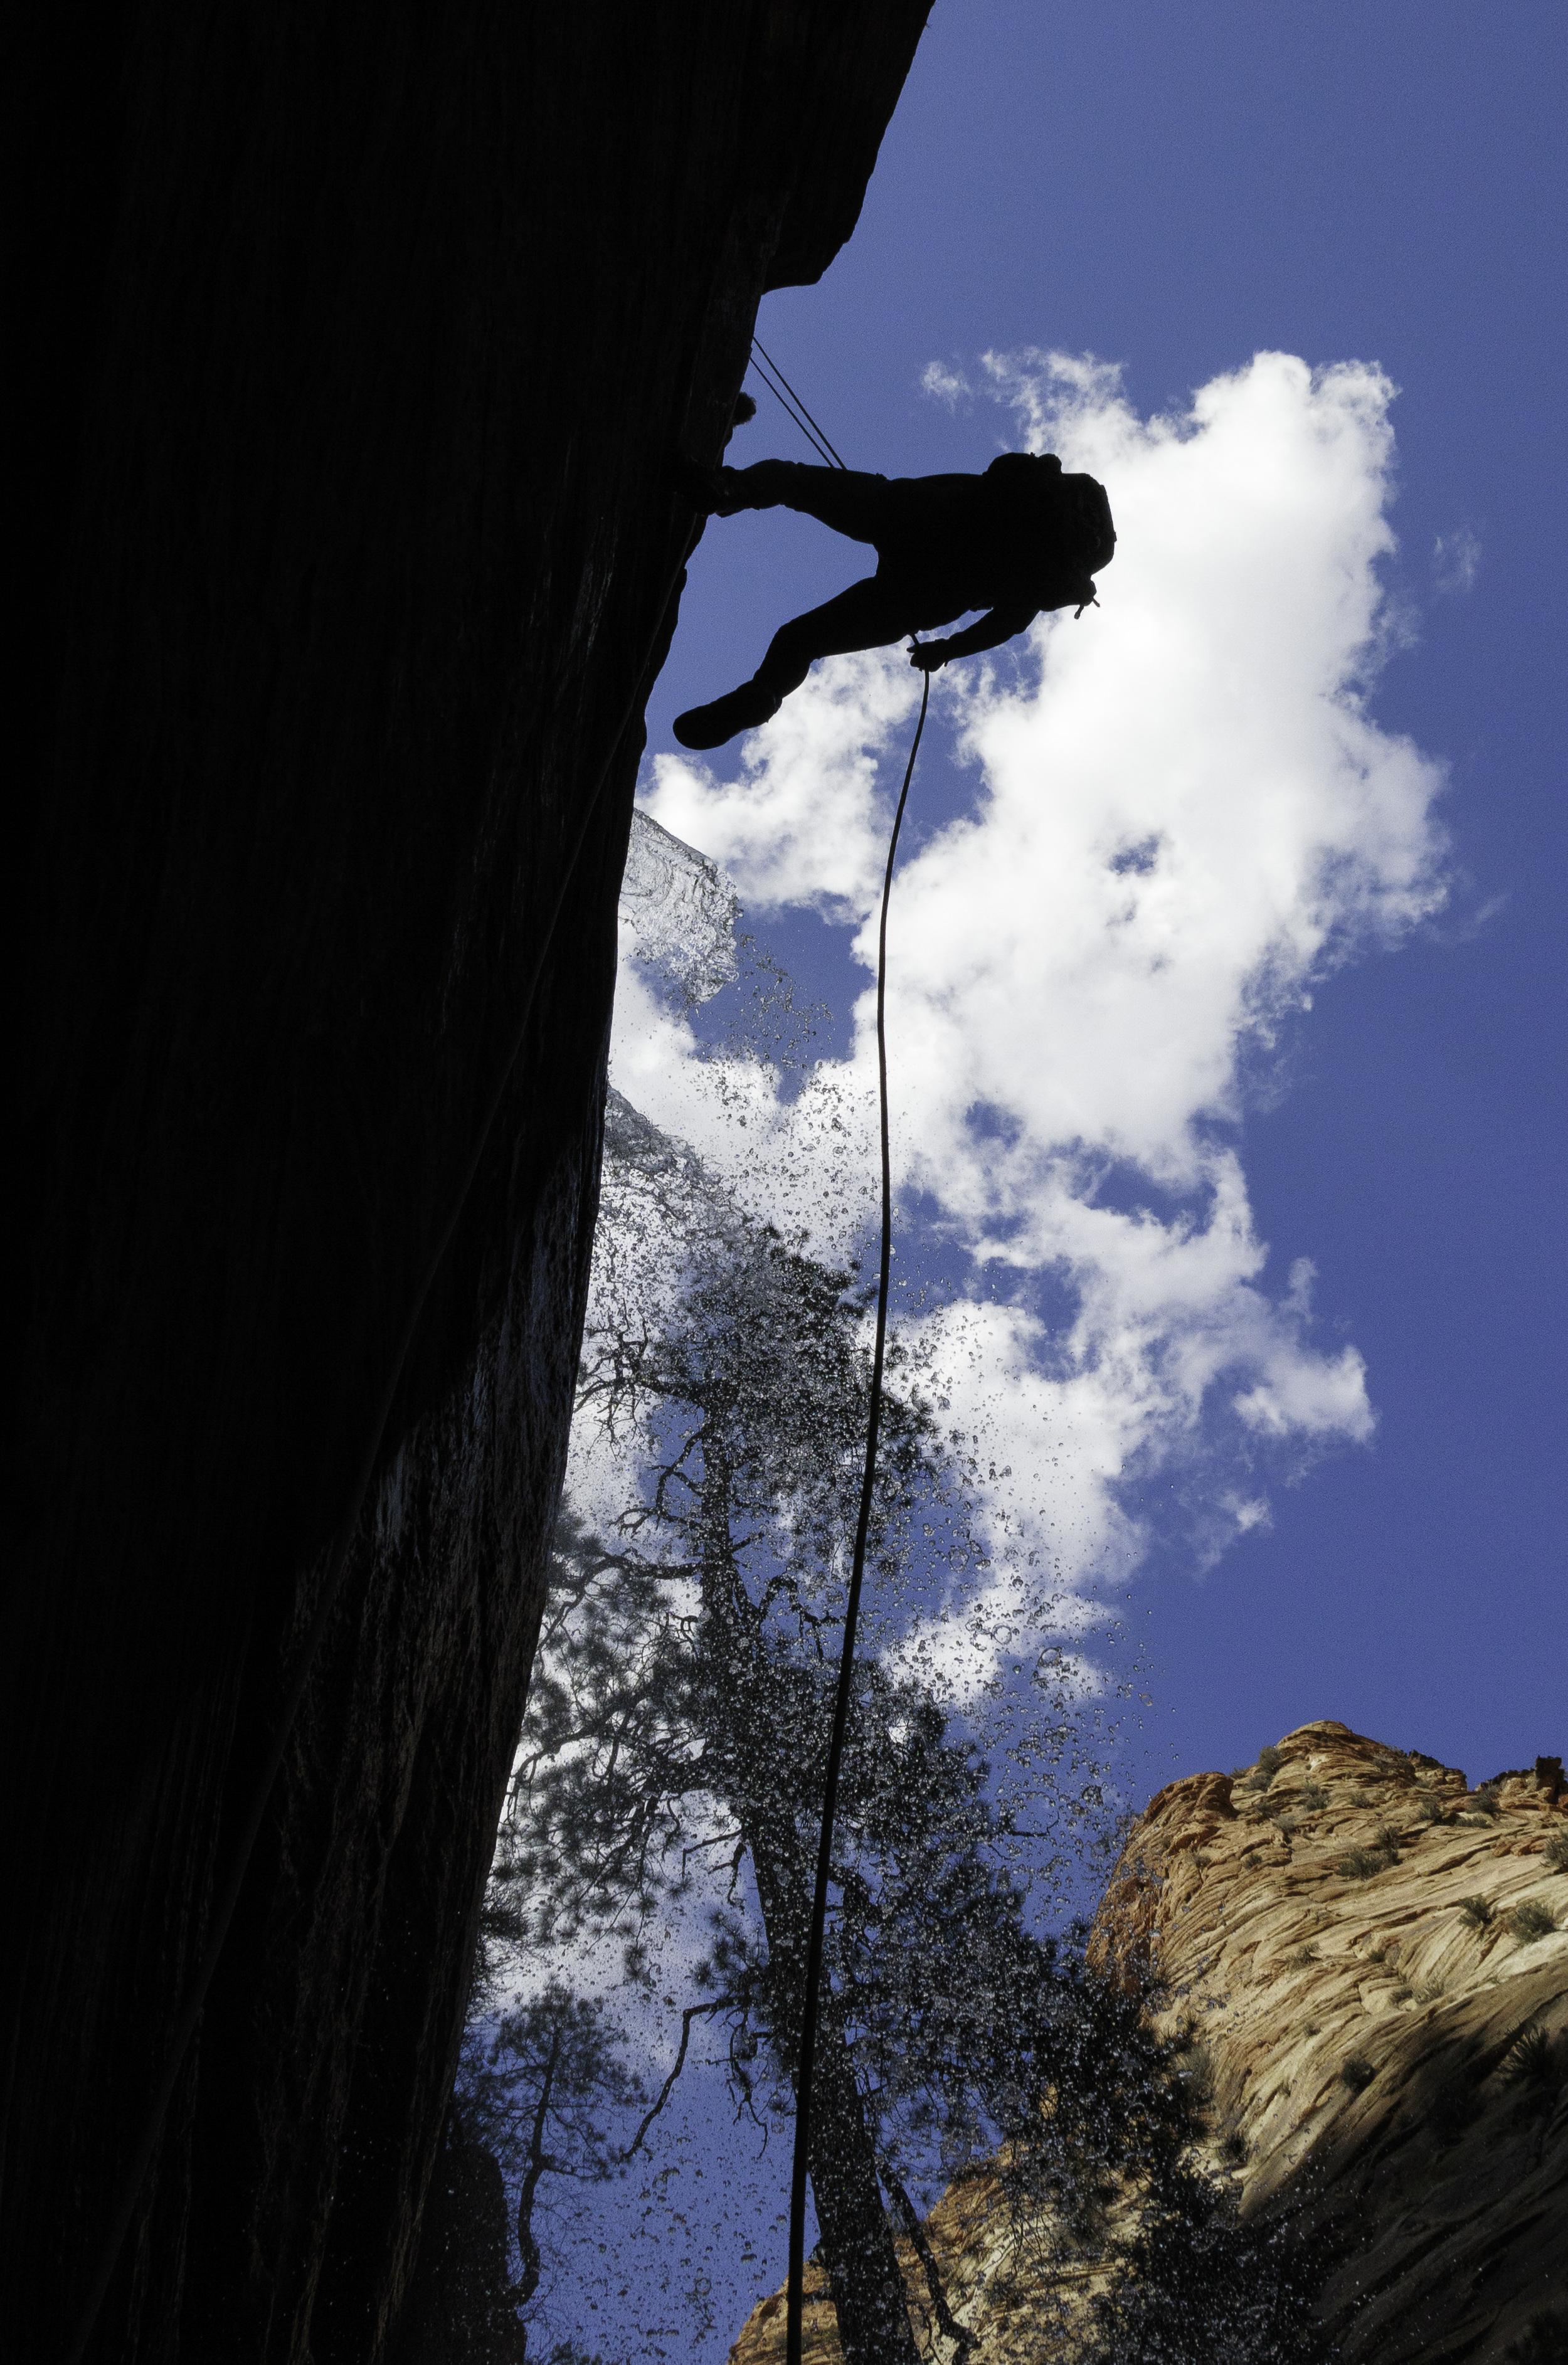 Zion_canyoneering-22.jpg